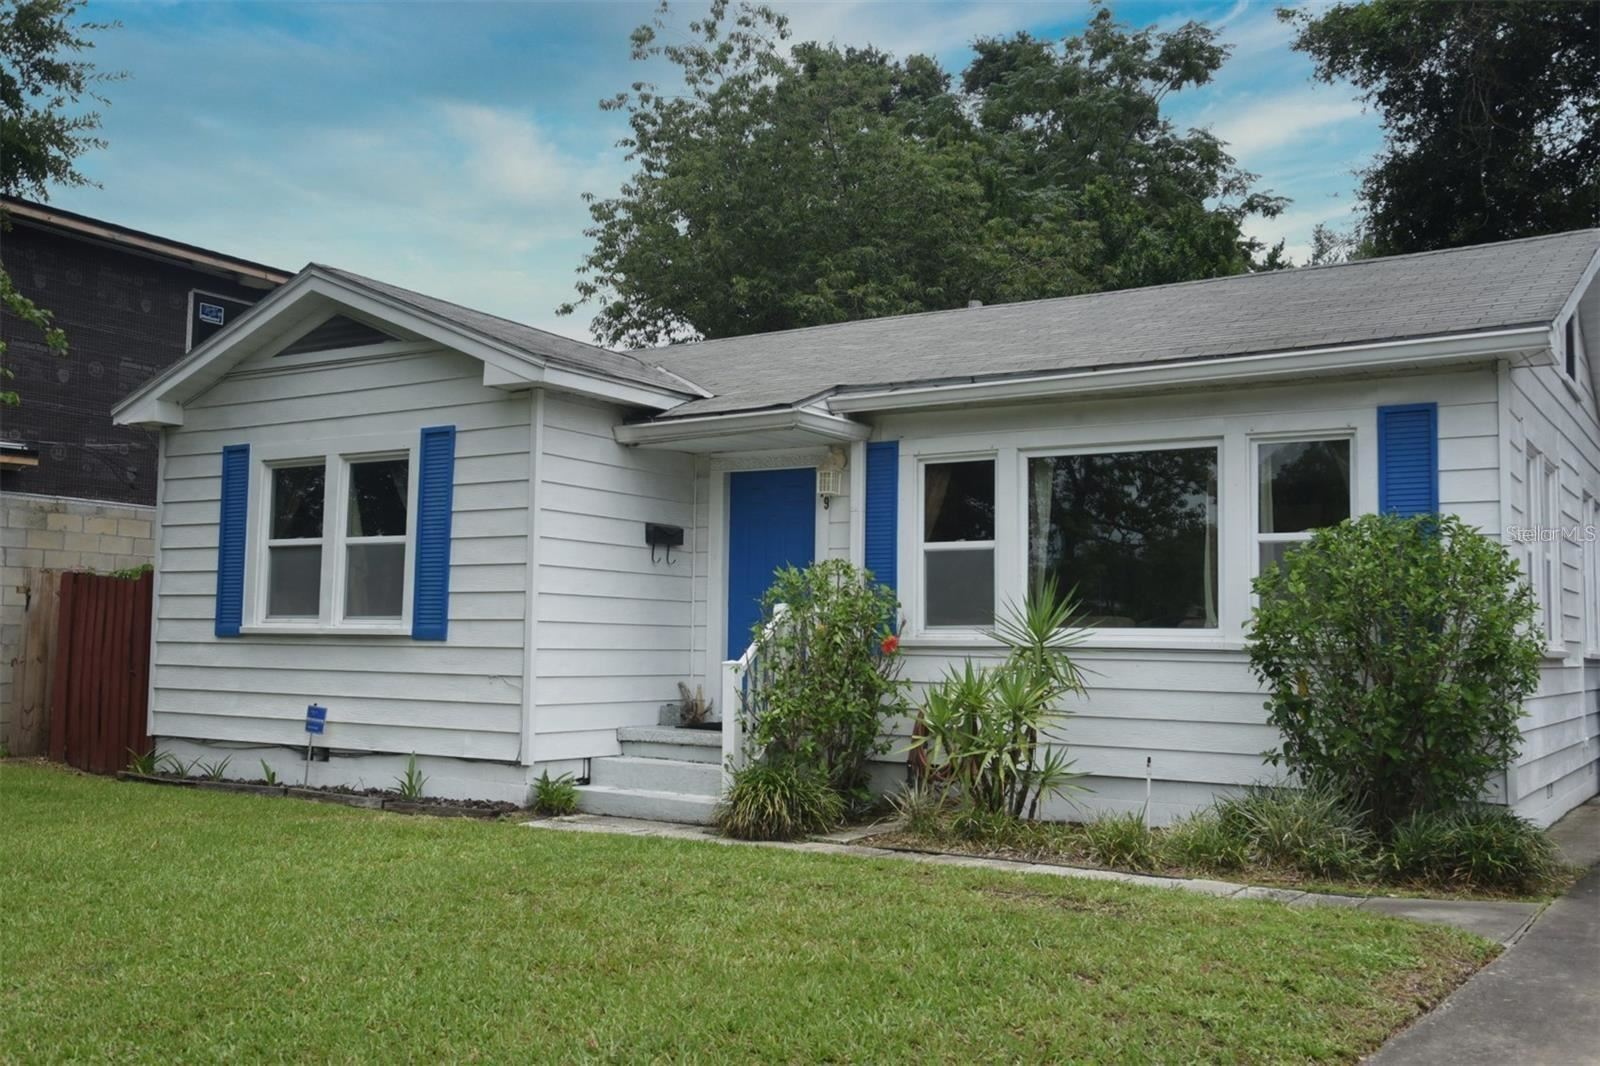 Photo of 79 W HARDING STREET, ORLANDO, FL 32806 (MLS # O5975545)